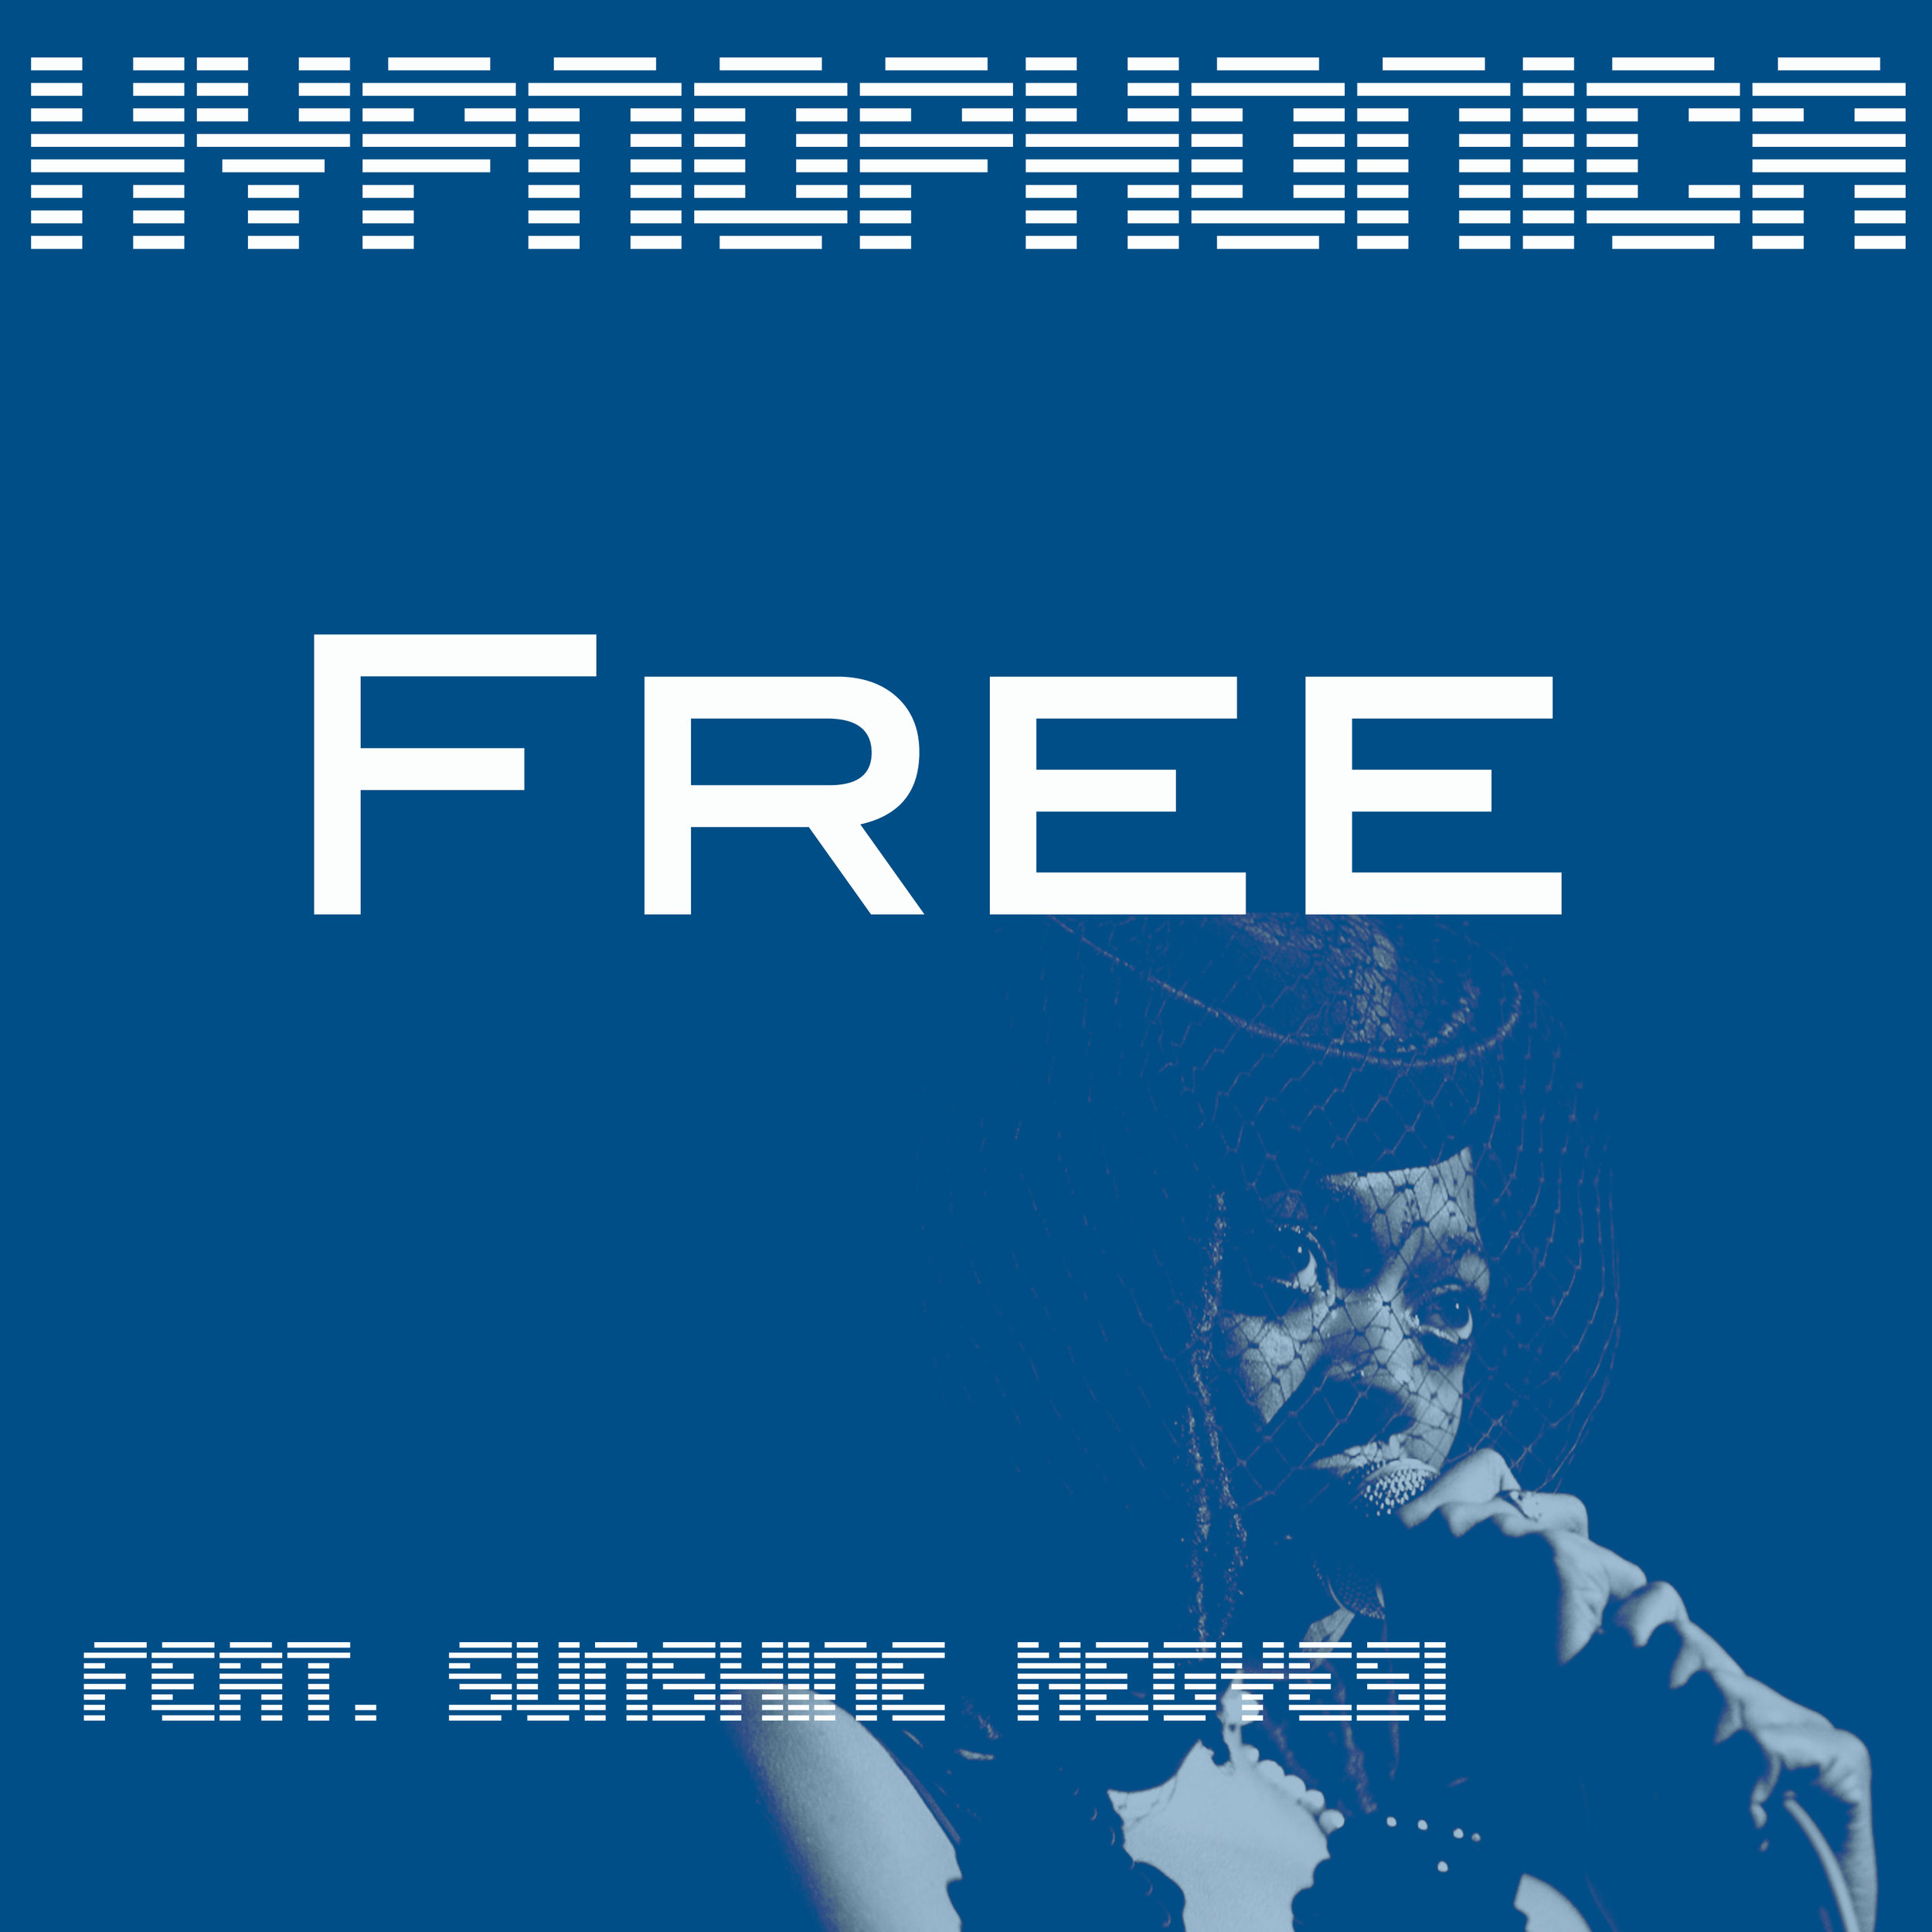 Hypnophonica_Free4.jpg